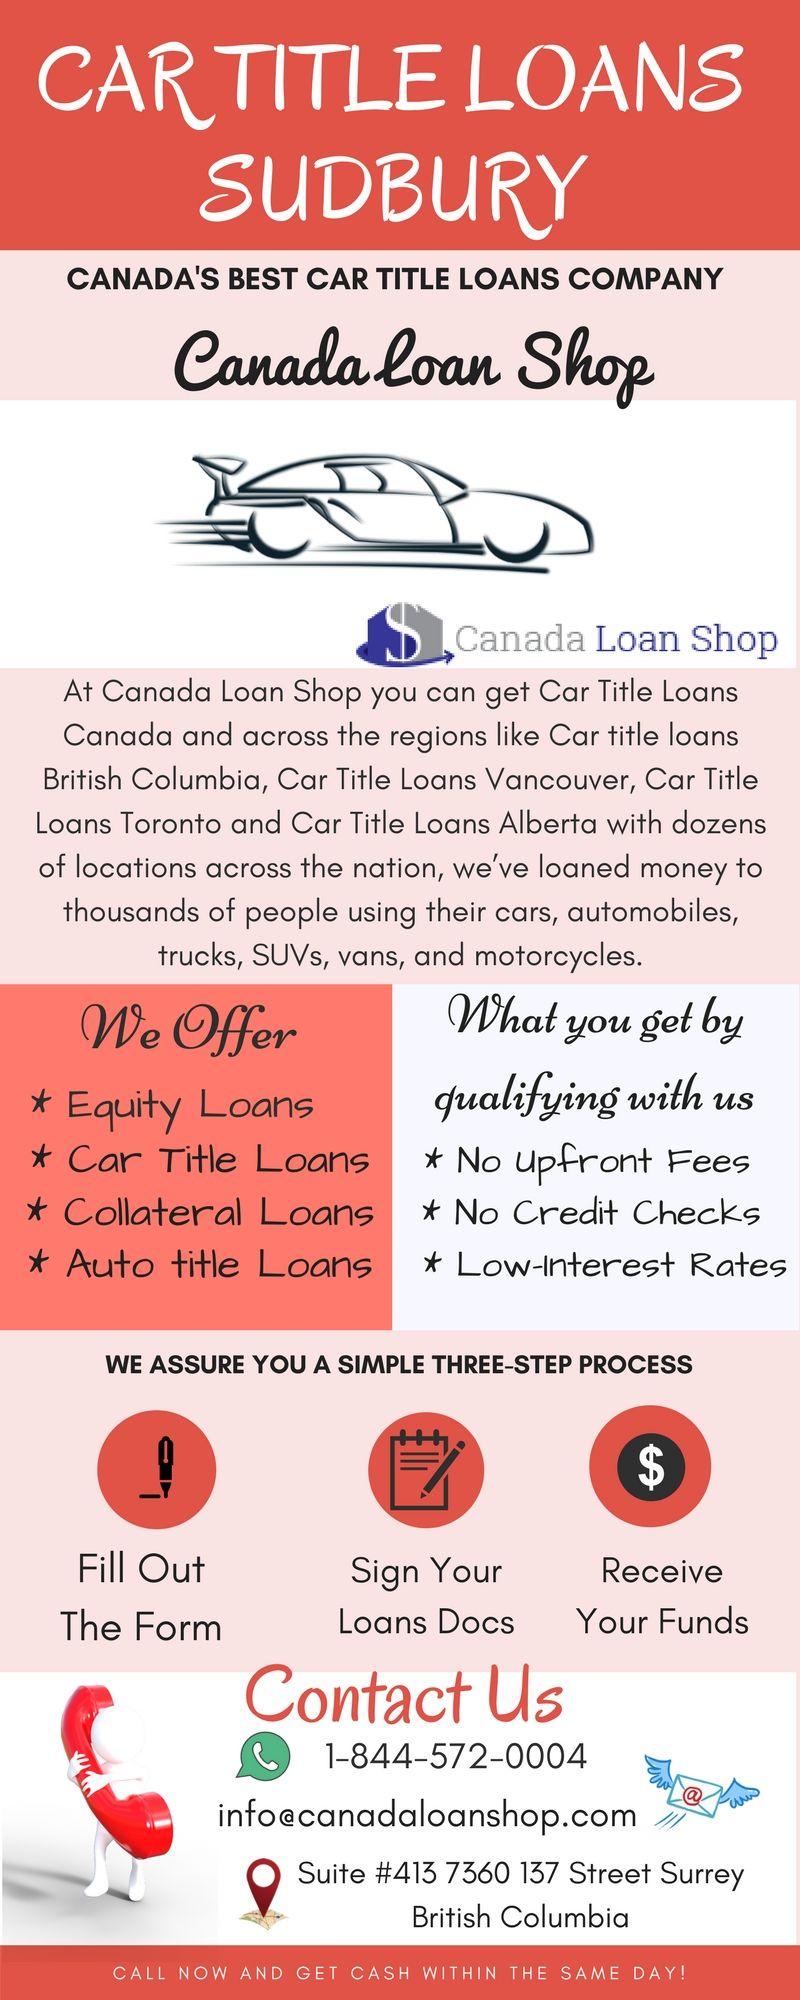 Car Title Loans Sudbury Car Title Loan Collateral Loans